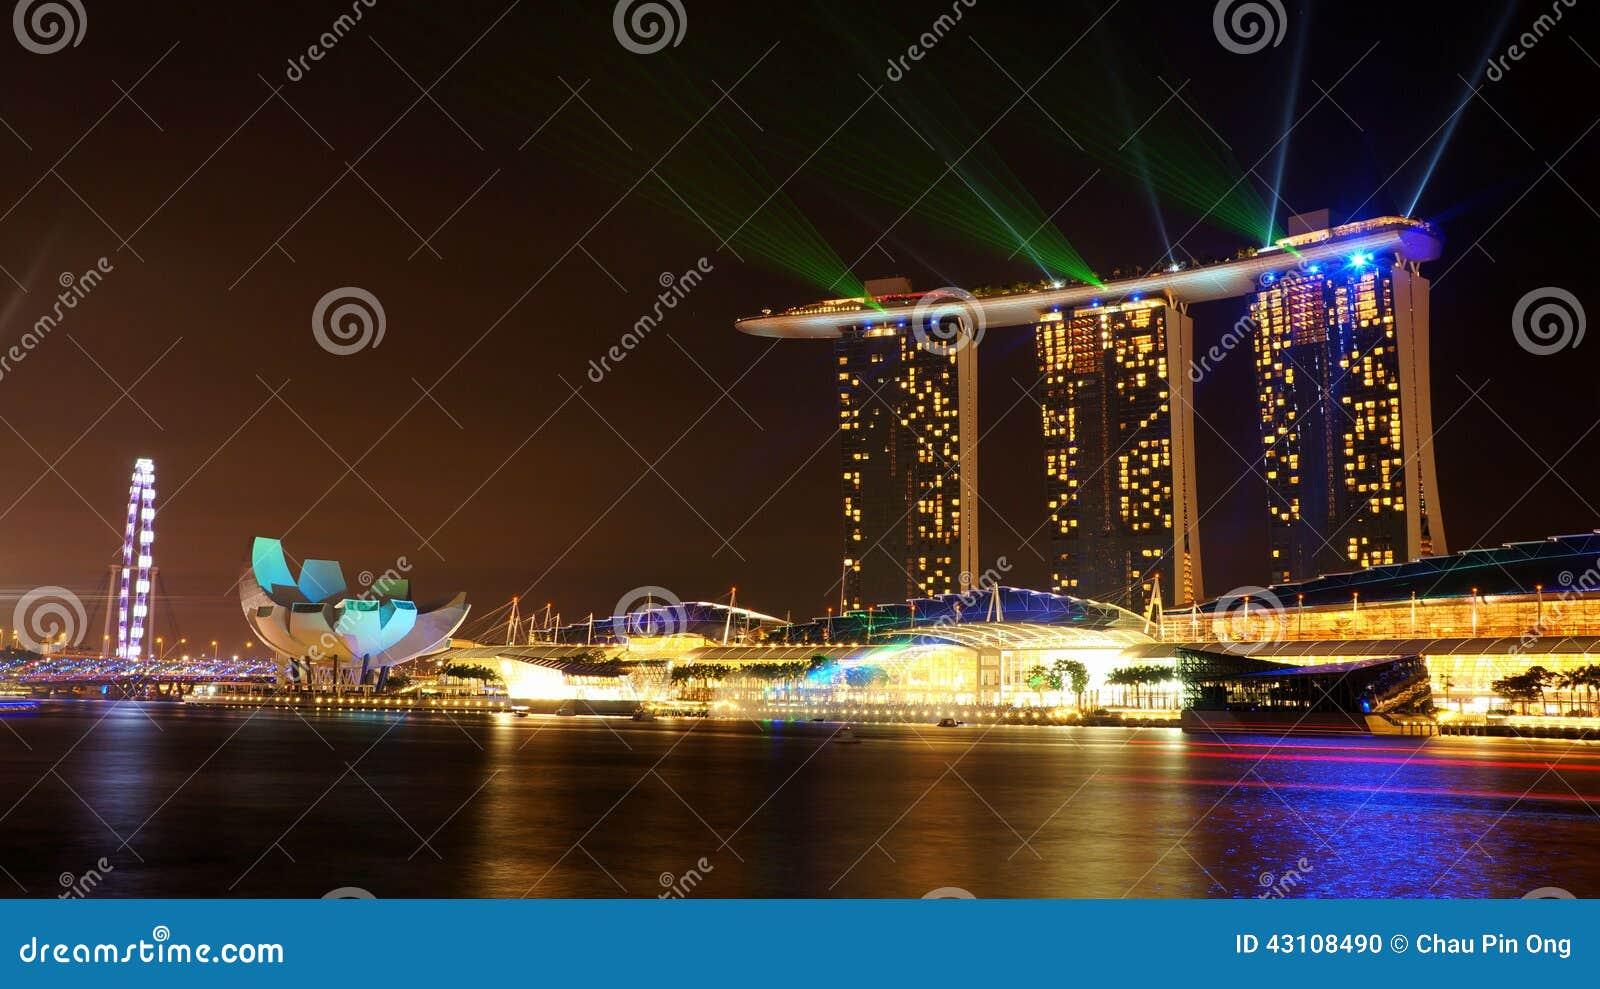 Marina Bay Sands Hotel 02 Stock Photo Image 43108490